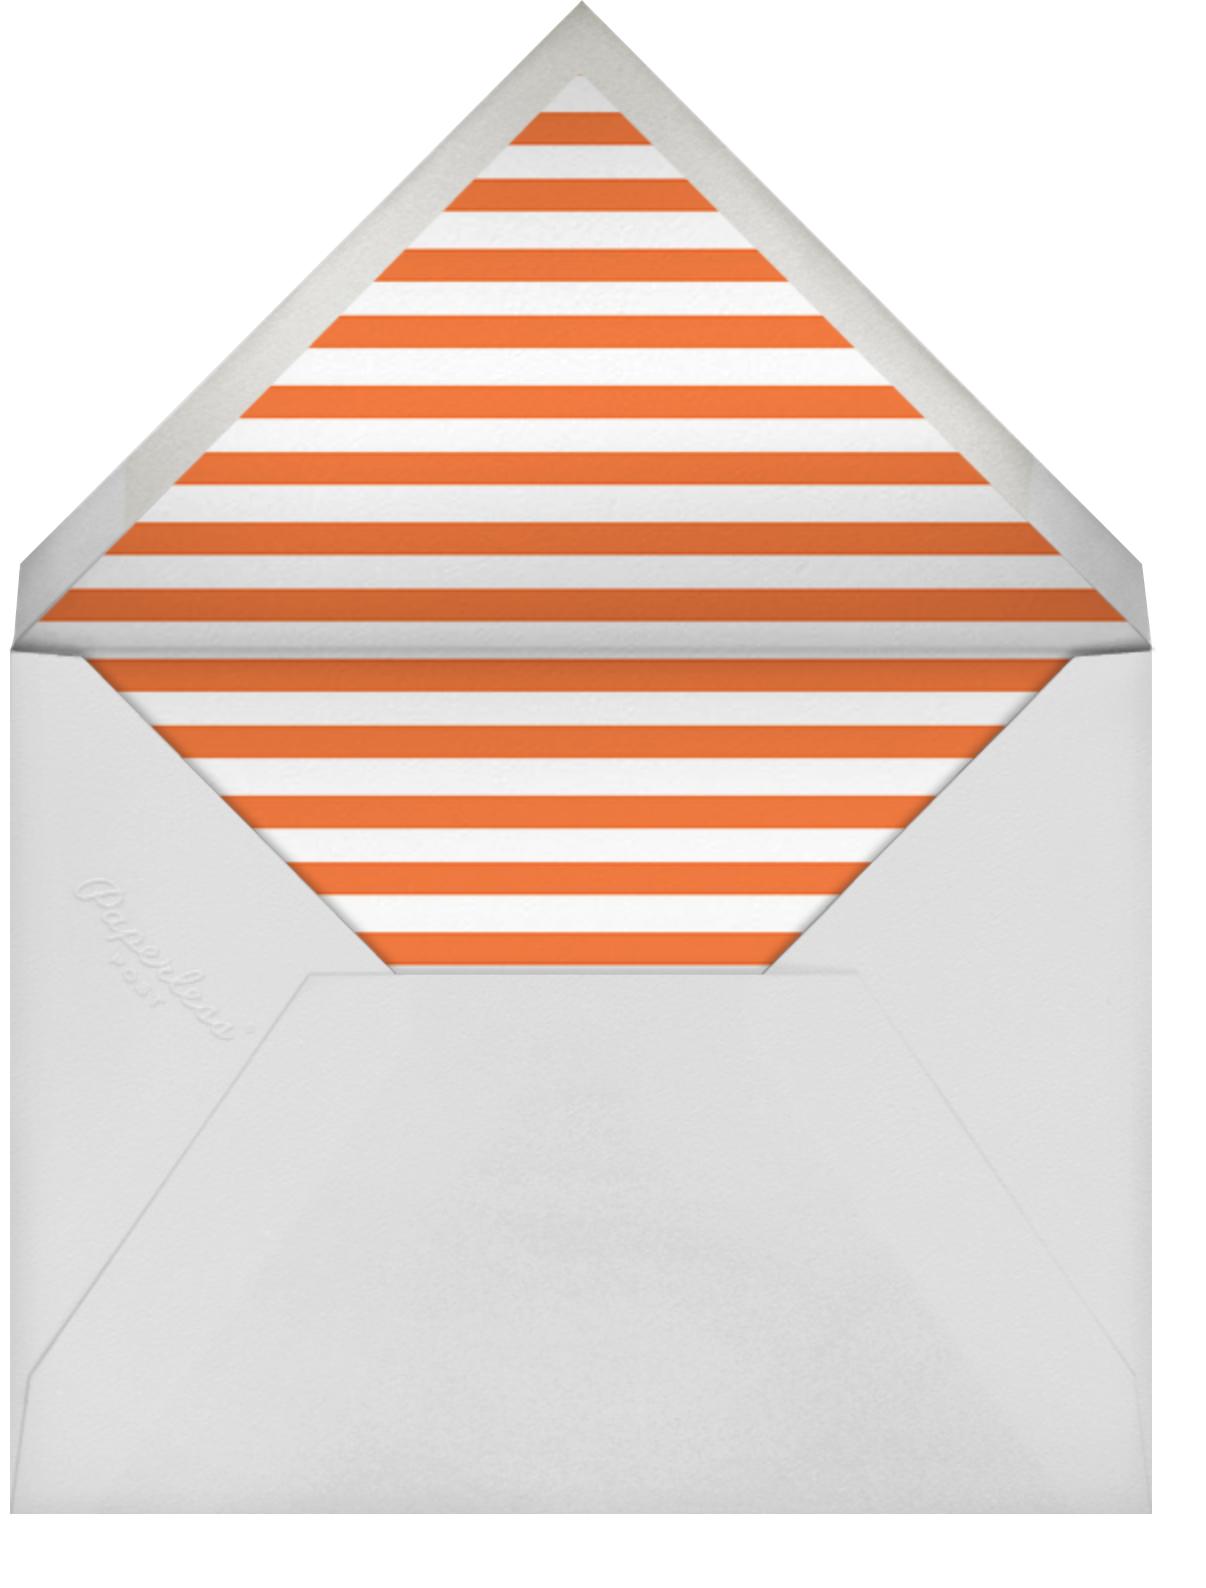 Party Hat - Teal - The Indigo Bunting - Kids' birthday - envelope back